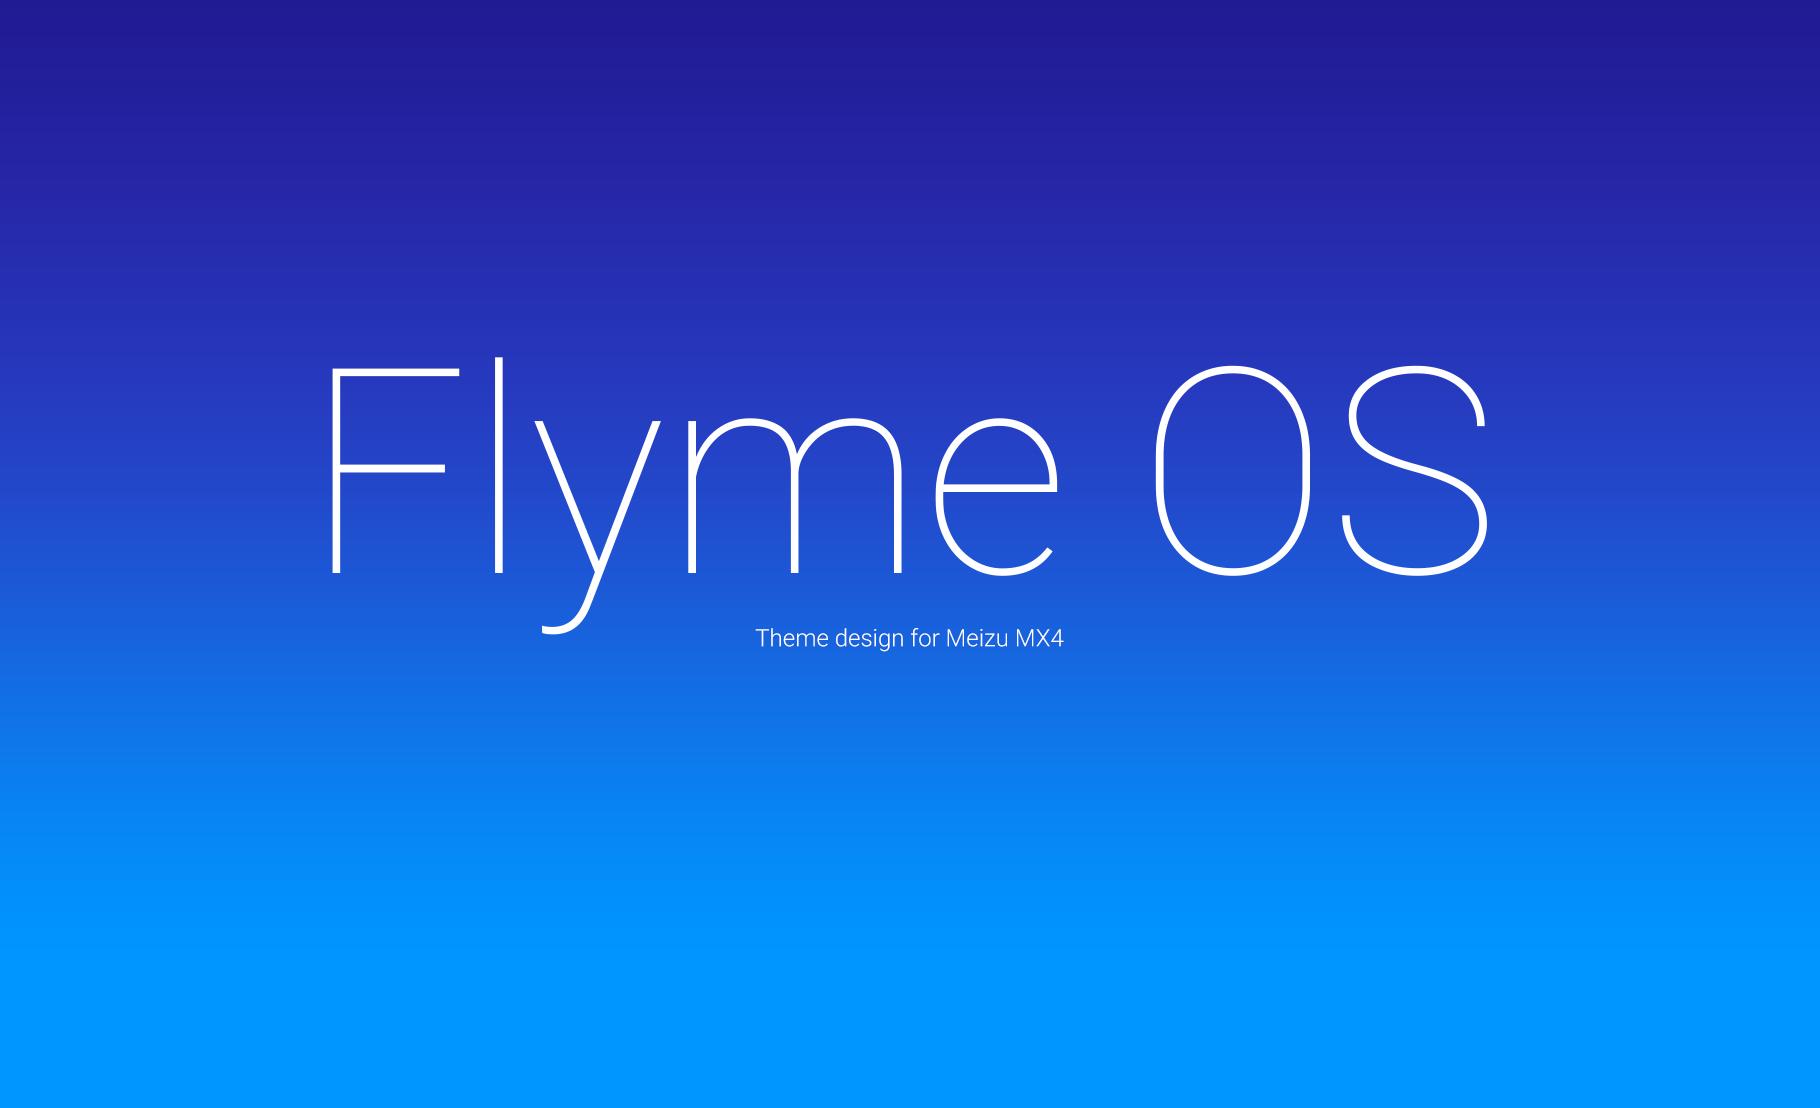 Theme design for Flyme OS on Behance